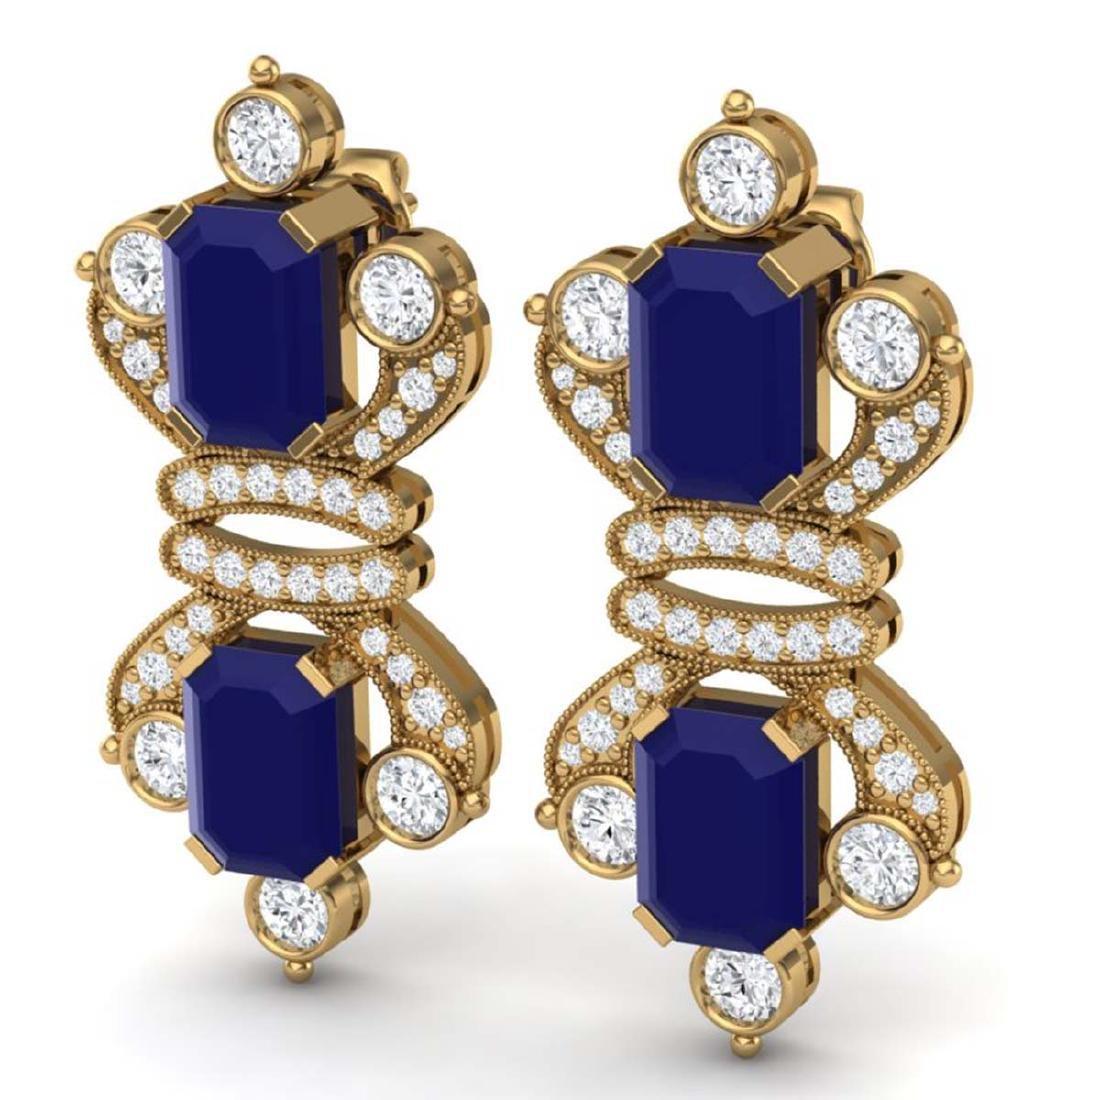 27.36 CTW Royalty Sapphire & VS Diamond Earrings 18K - 2